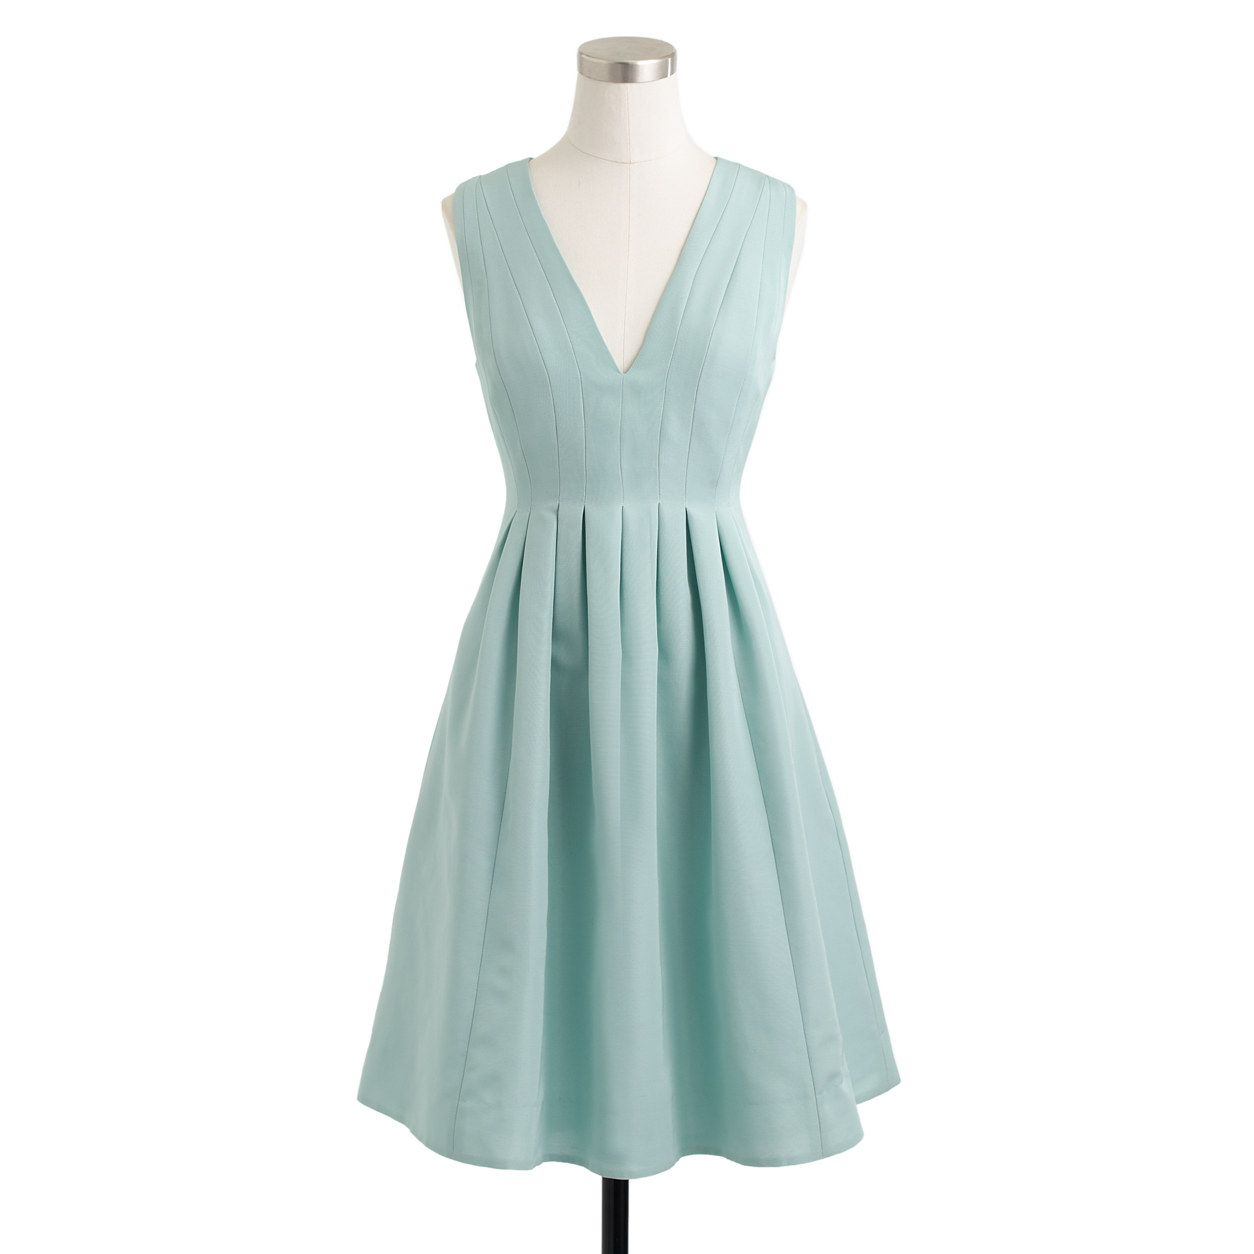 Jcrew wedding dress  Sophie dress in classic faille  Classic Faille  Weddingus